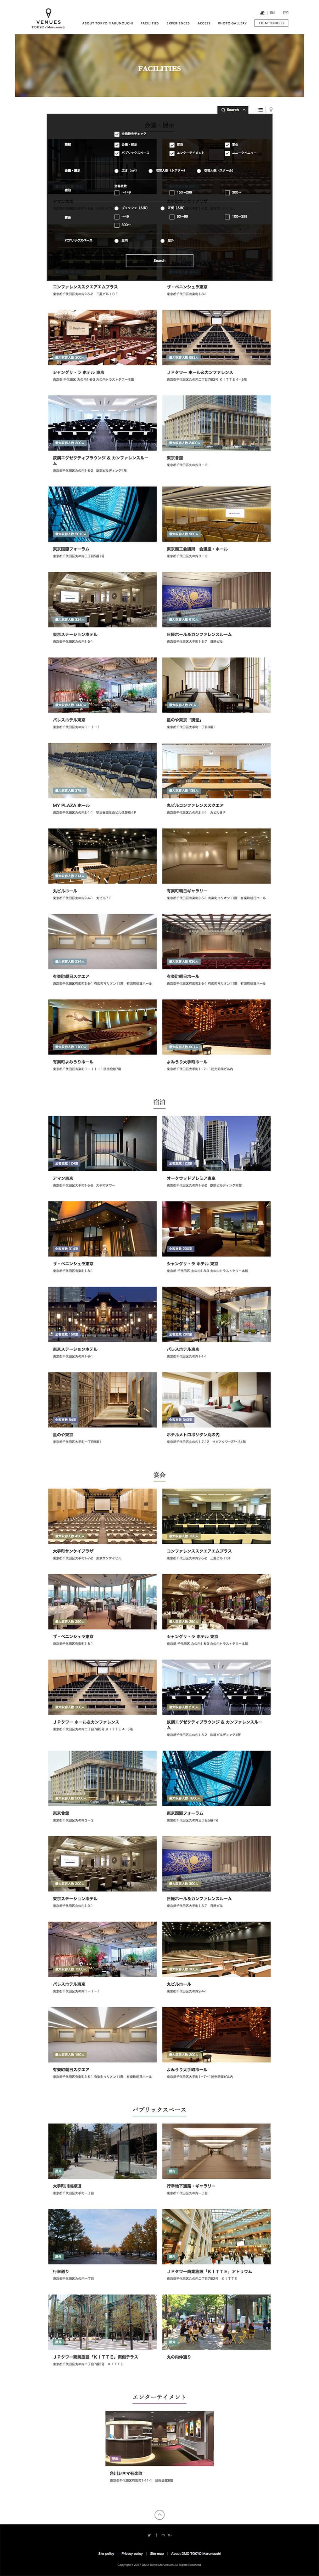 DMO東京丸の内 MICE業界向けオフィシャルWEBサイト